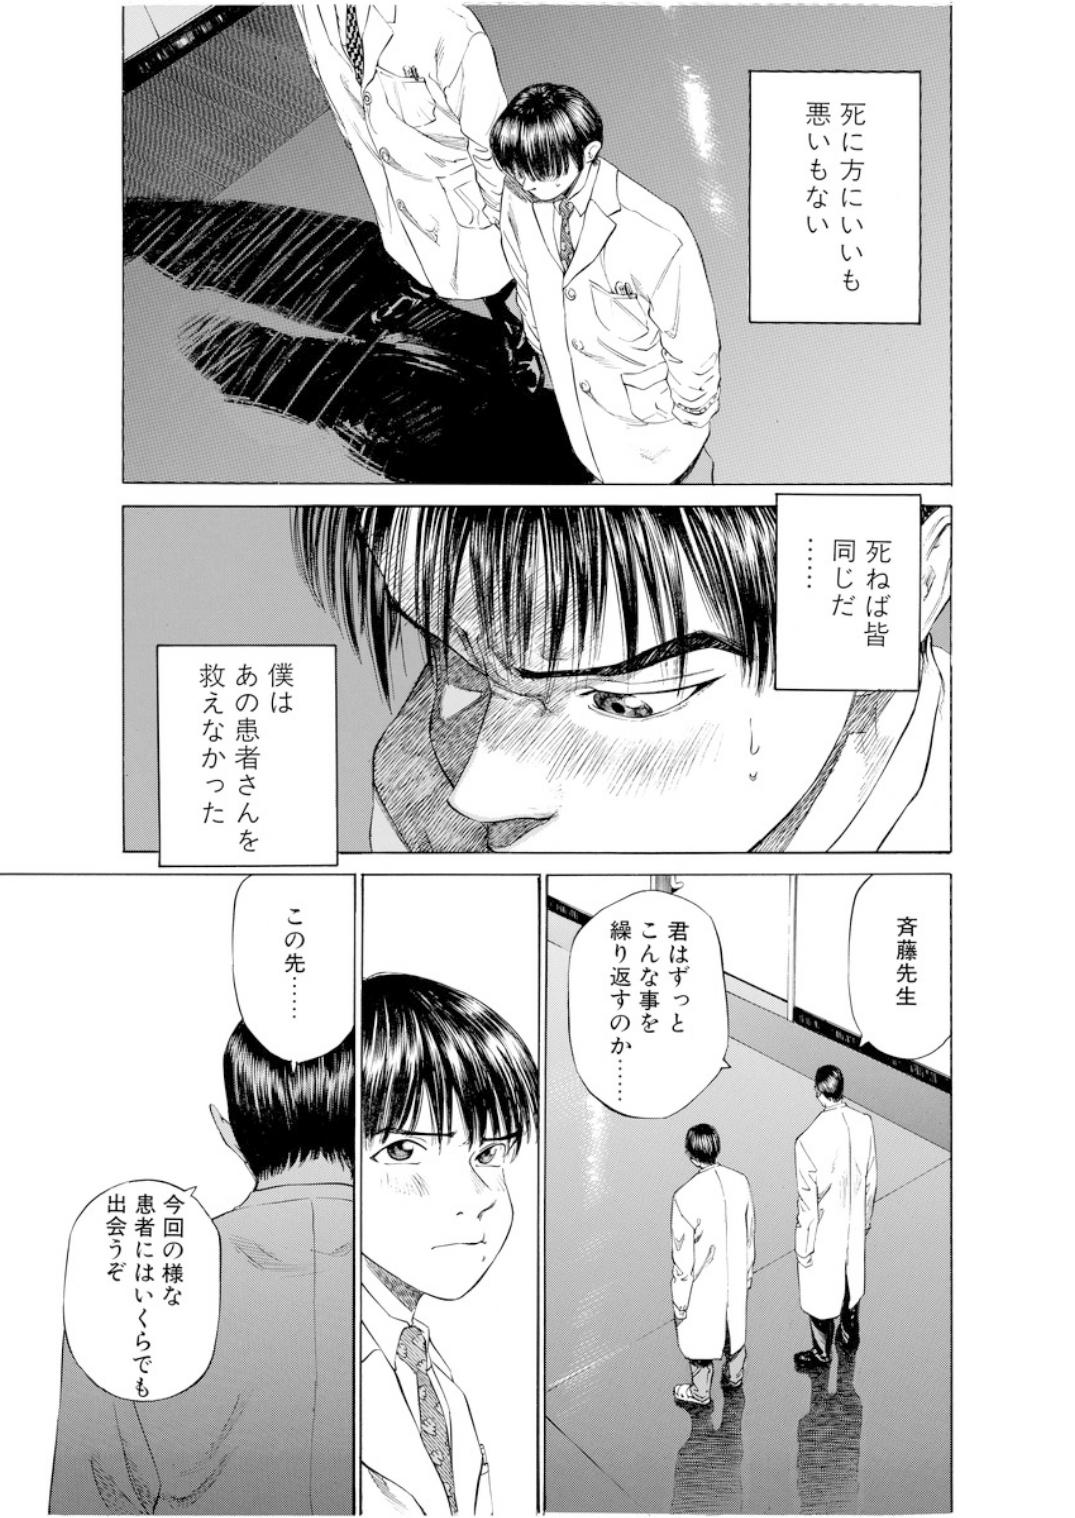 001bj_page-0141.jpg